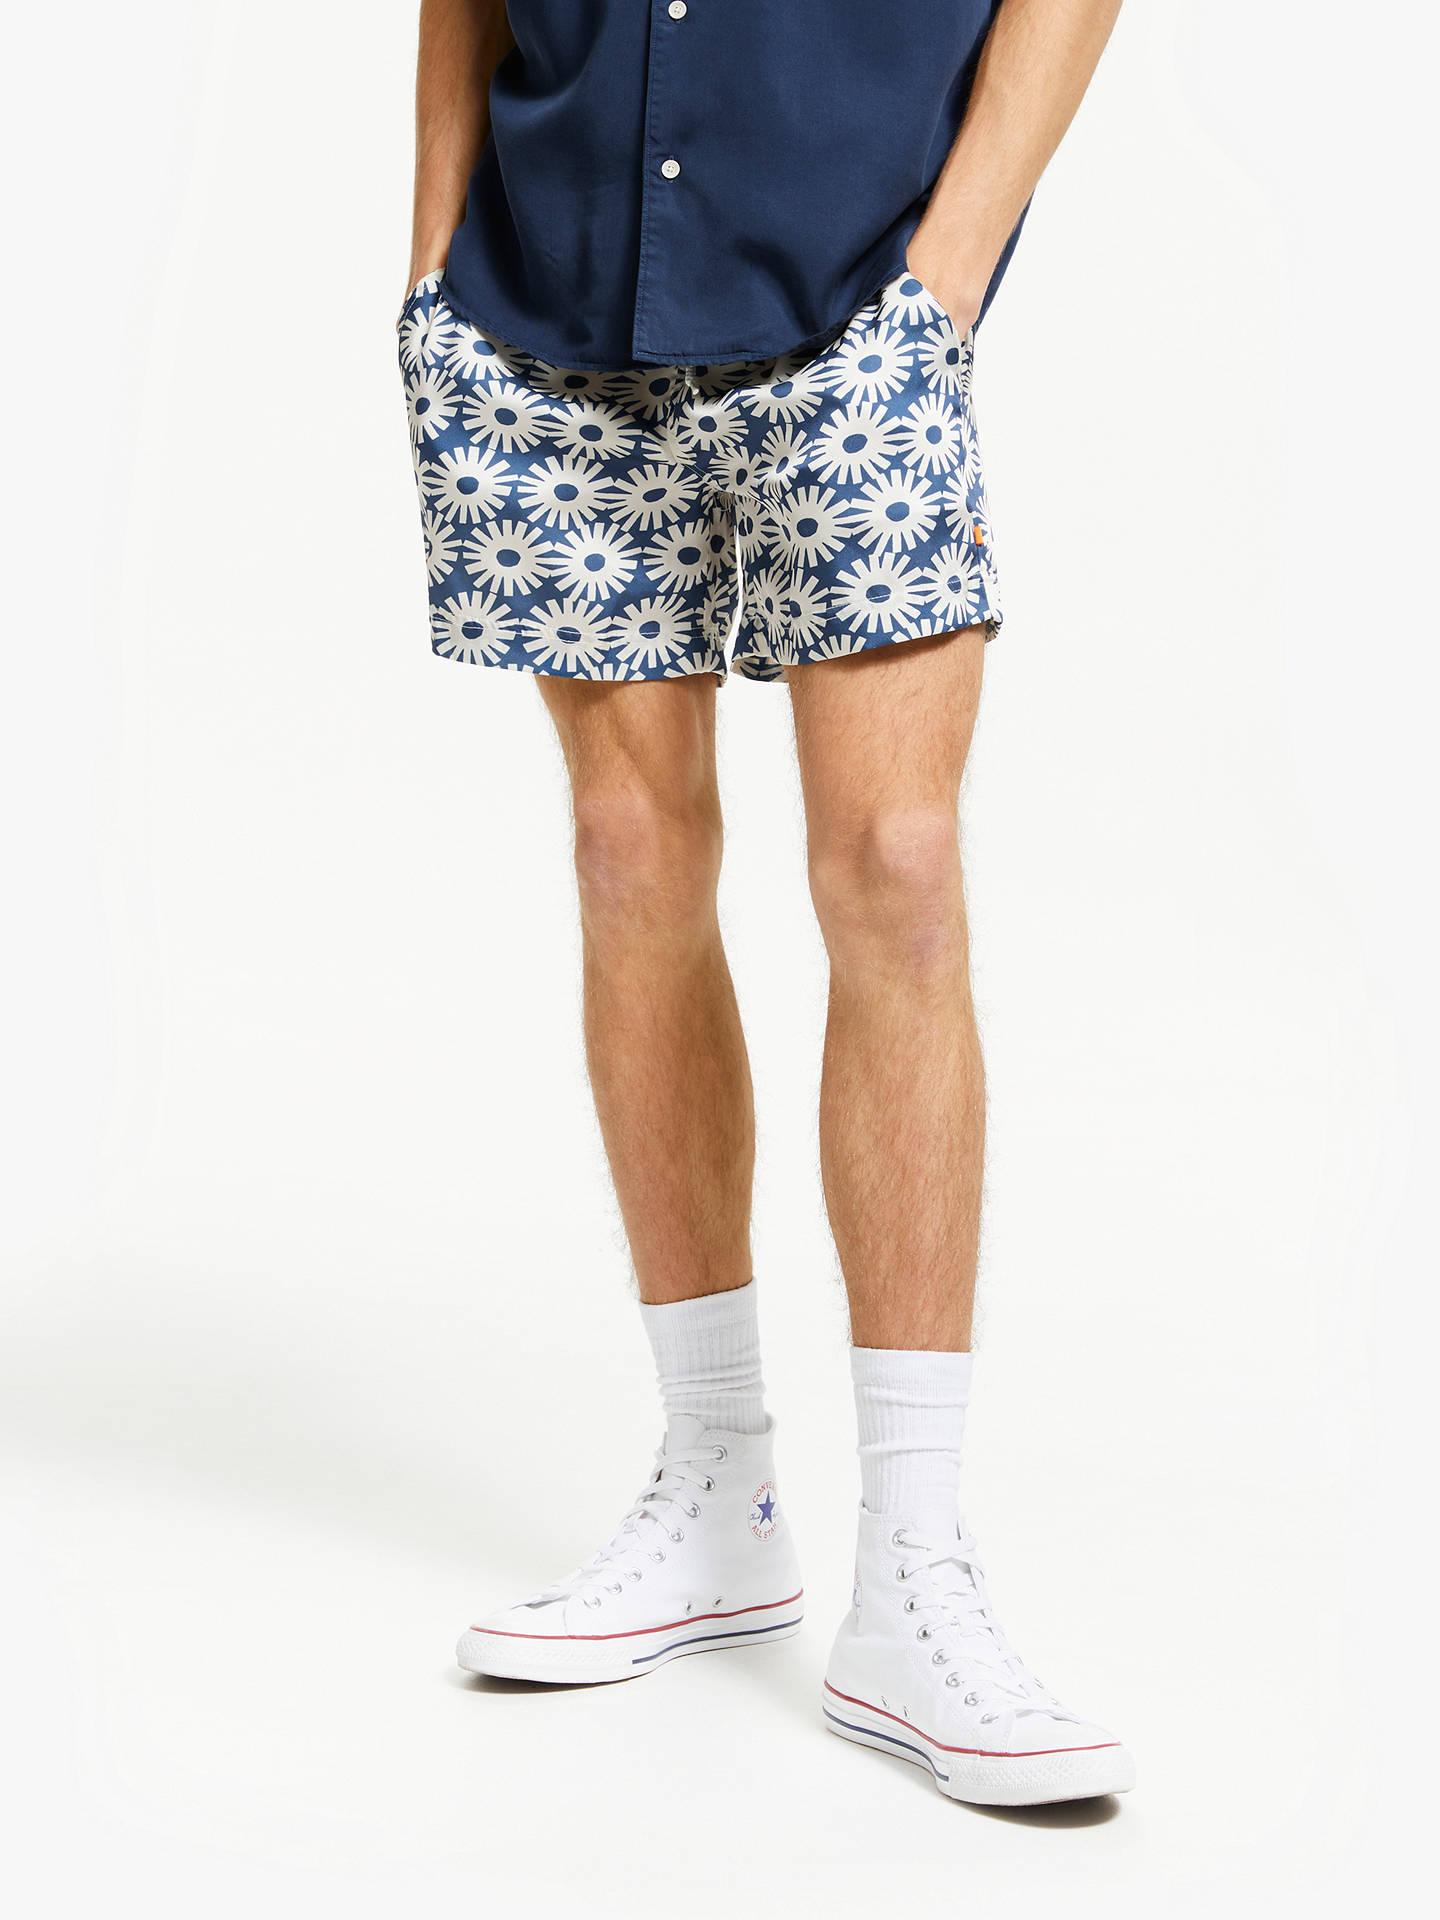 528f28a7a4 Buy Far Afield Floral Swim Shorts, Epik Blue, S Online at johnlewis.com ...